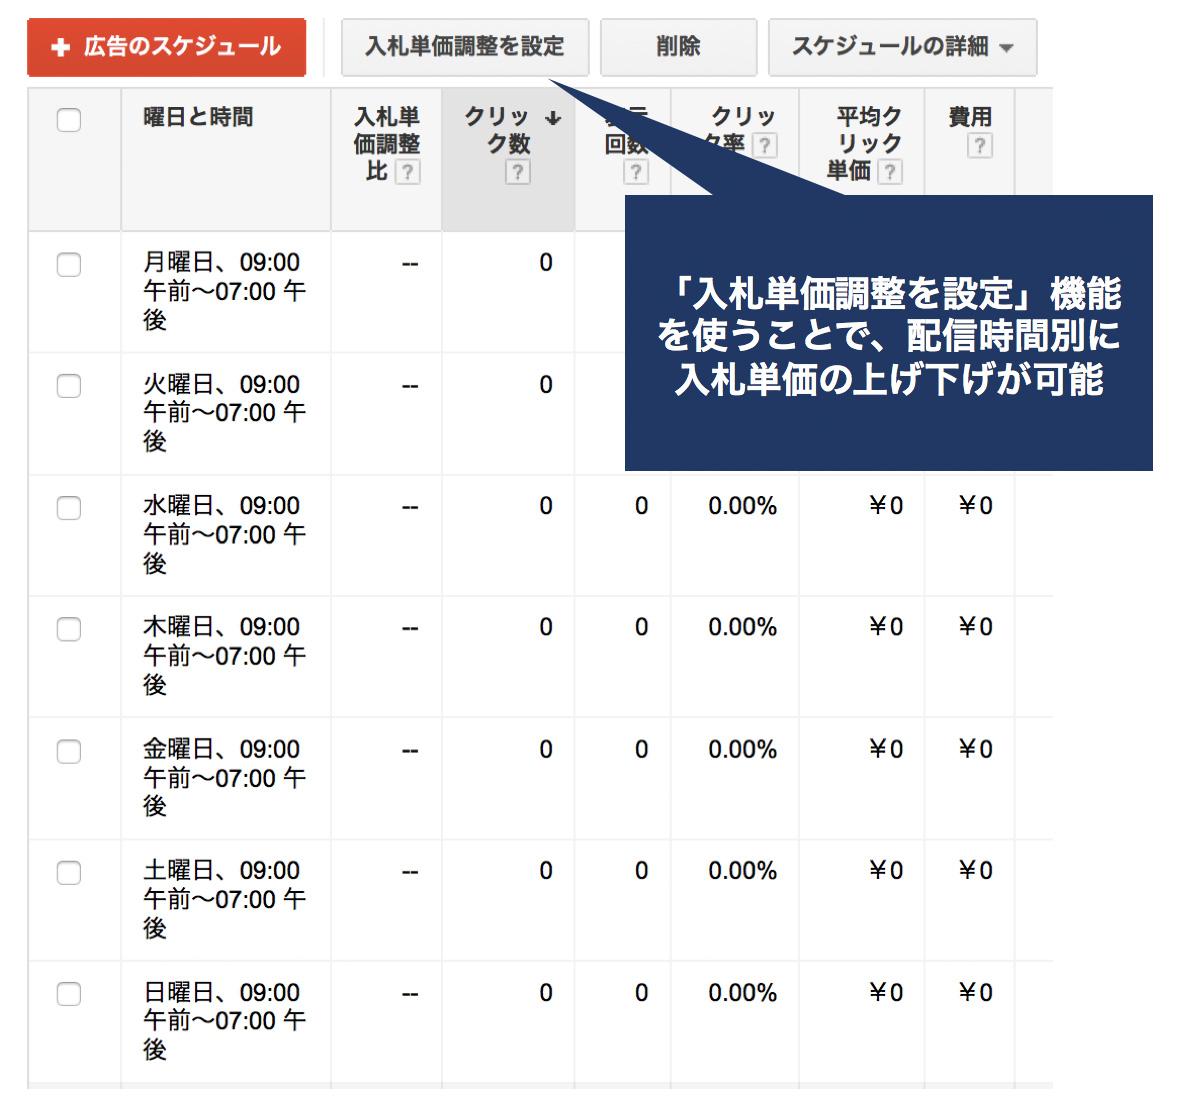 %e5%ba%83%e5%91%8a%e9%85%8d%e4%bf%a1%e6%99%82%e9%96%93%e6%af%8e%e3%81%ae%e4%b8%8a%e9%99%90%e3%82%af%e3%83%aa%e3%83%83%e3%82%af%e5%8d%98%e4%be%a1%e8%a8%ad%e5%ae%9a